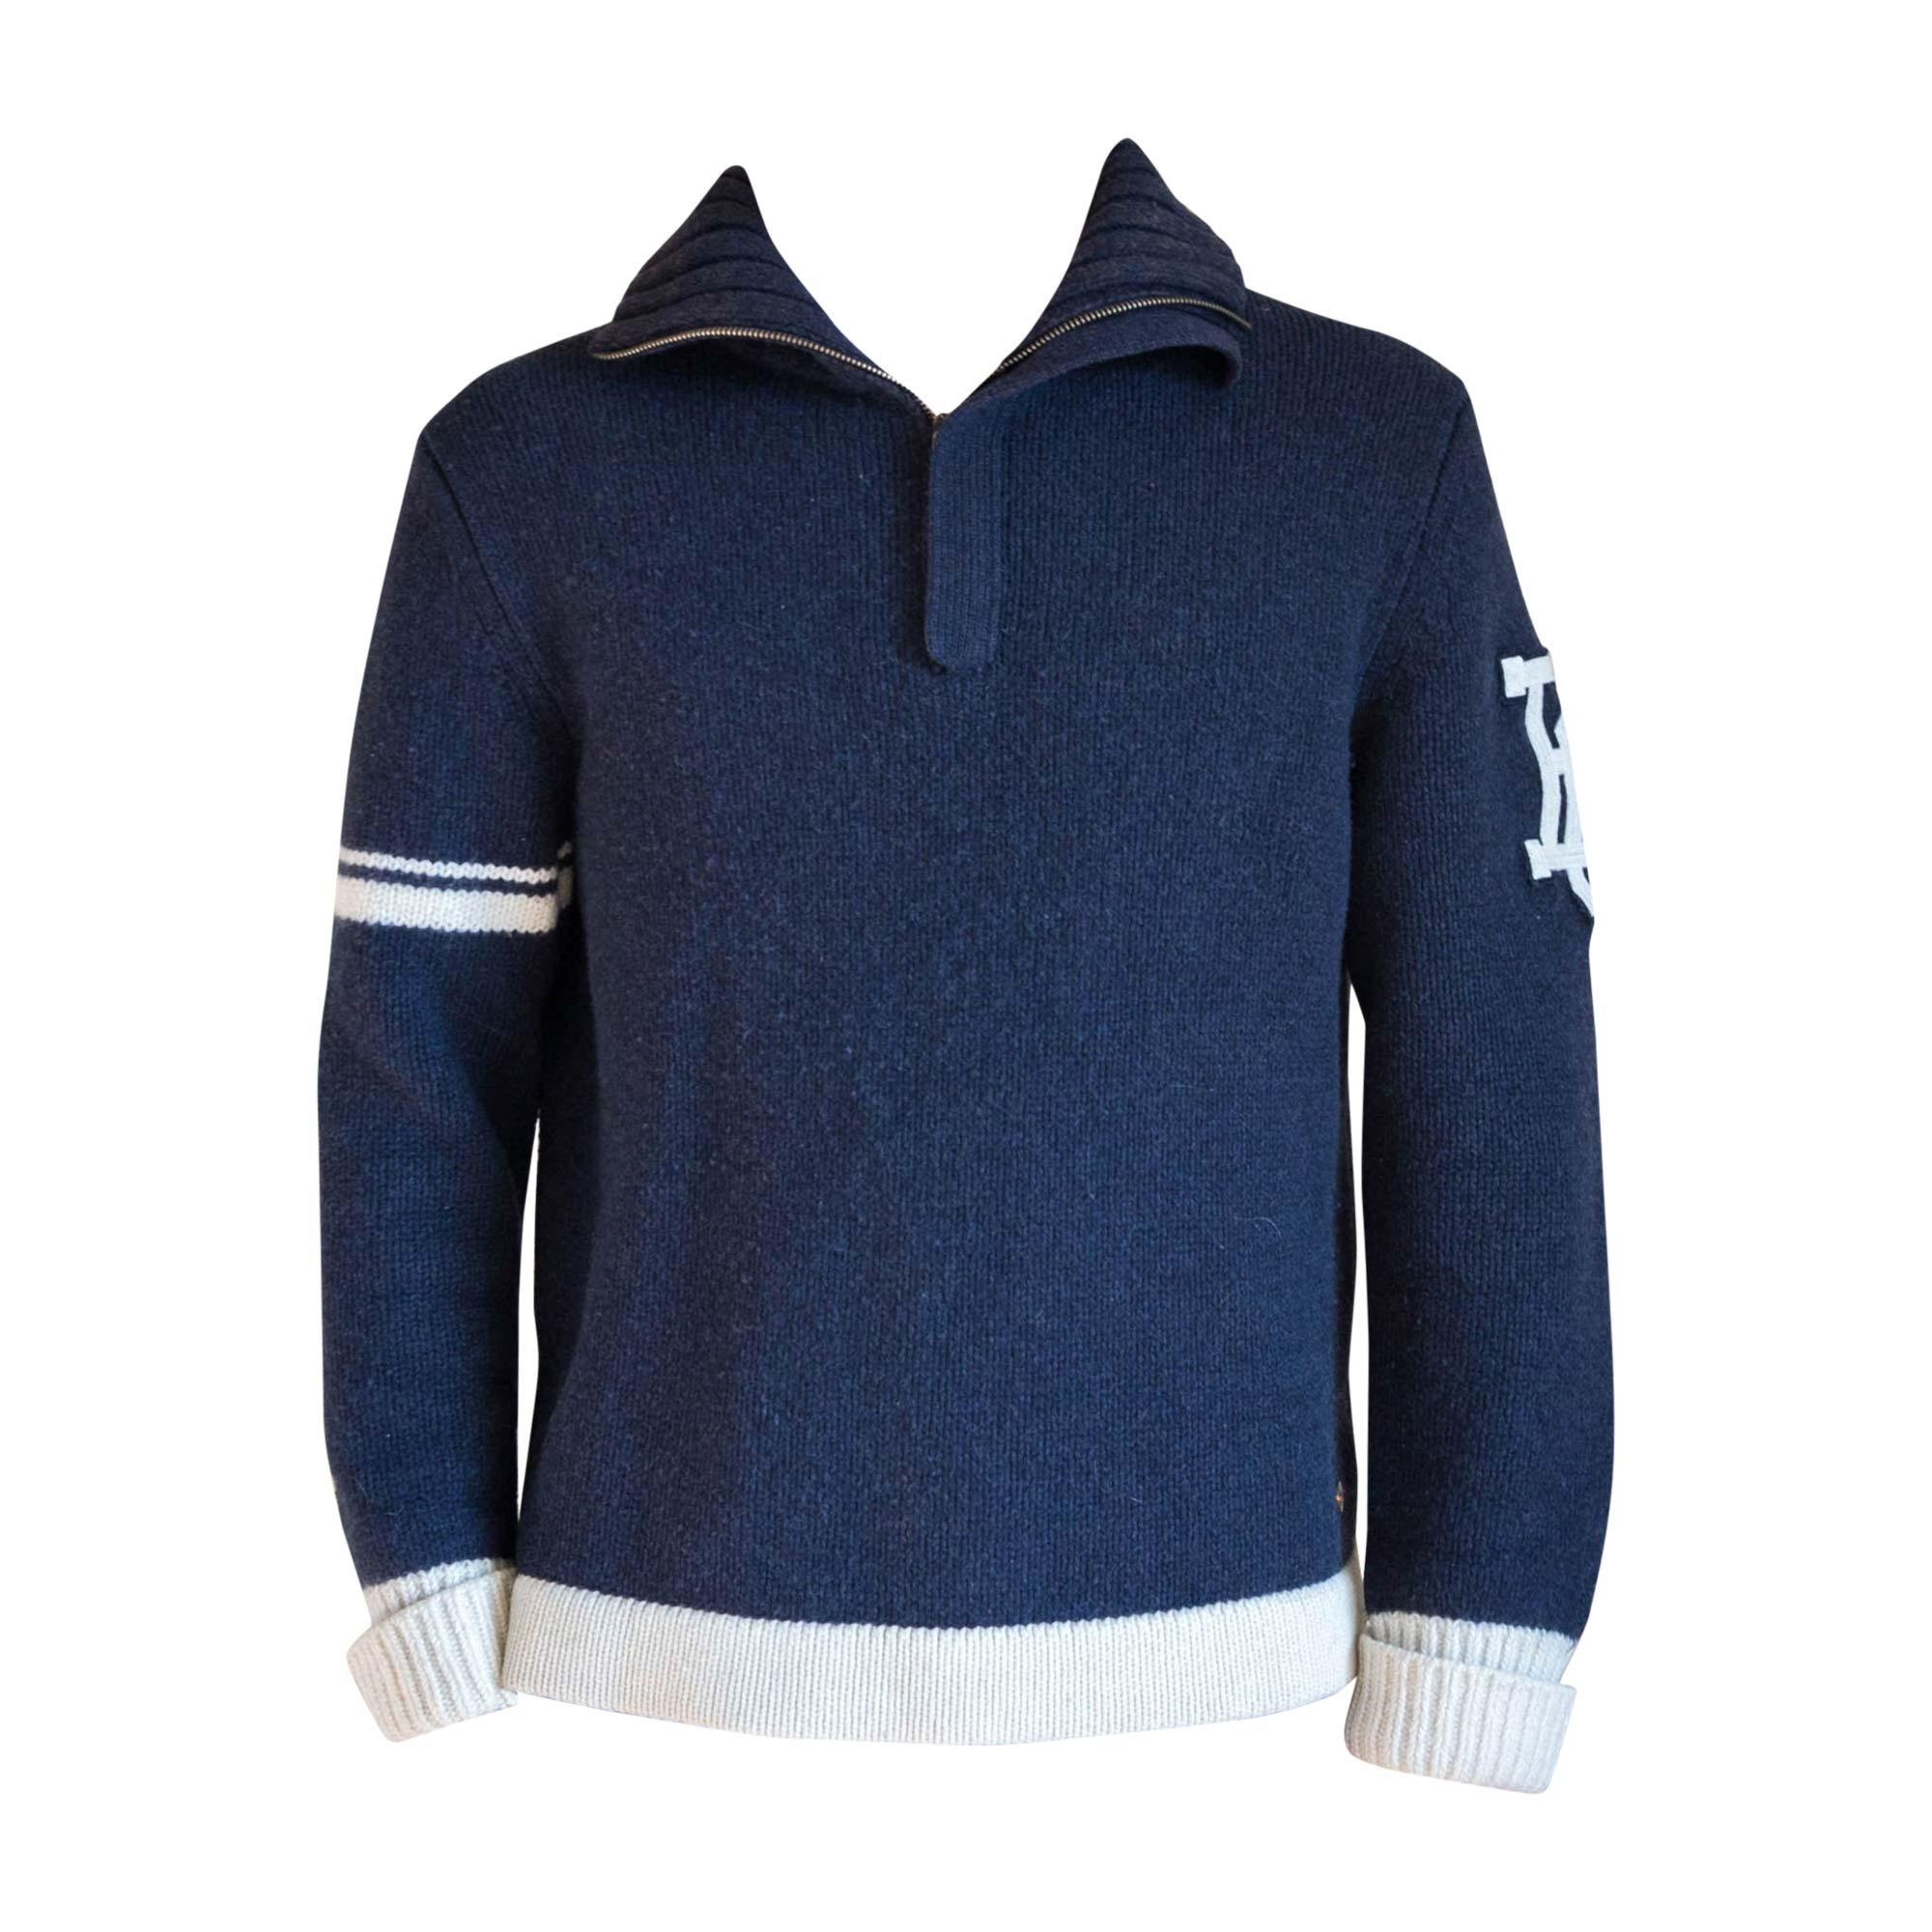 Maglione HUGO BOSS Blu, blu navy, turchese